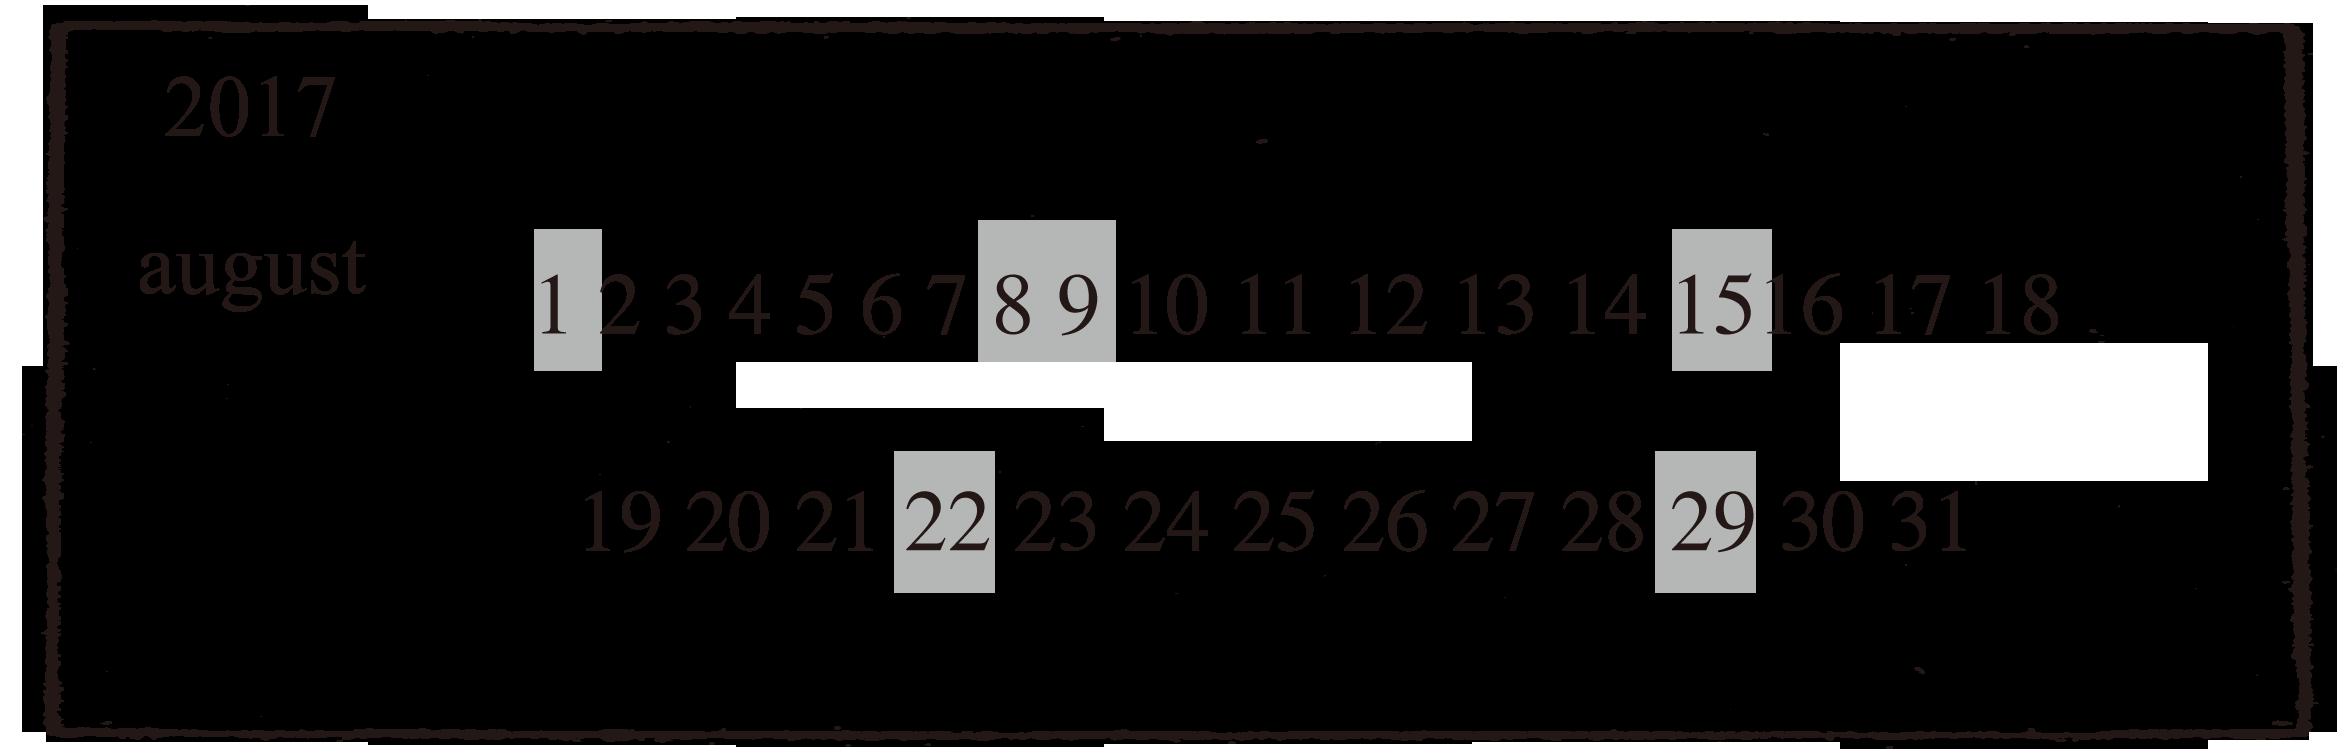 2017.08